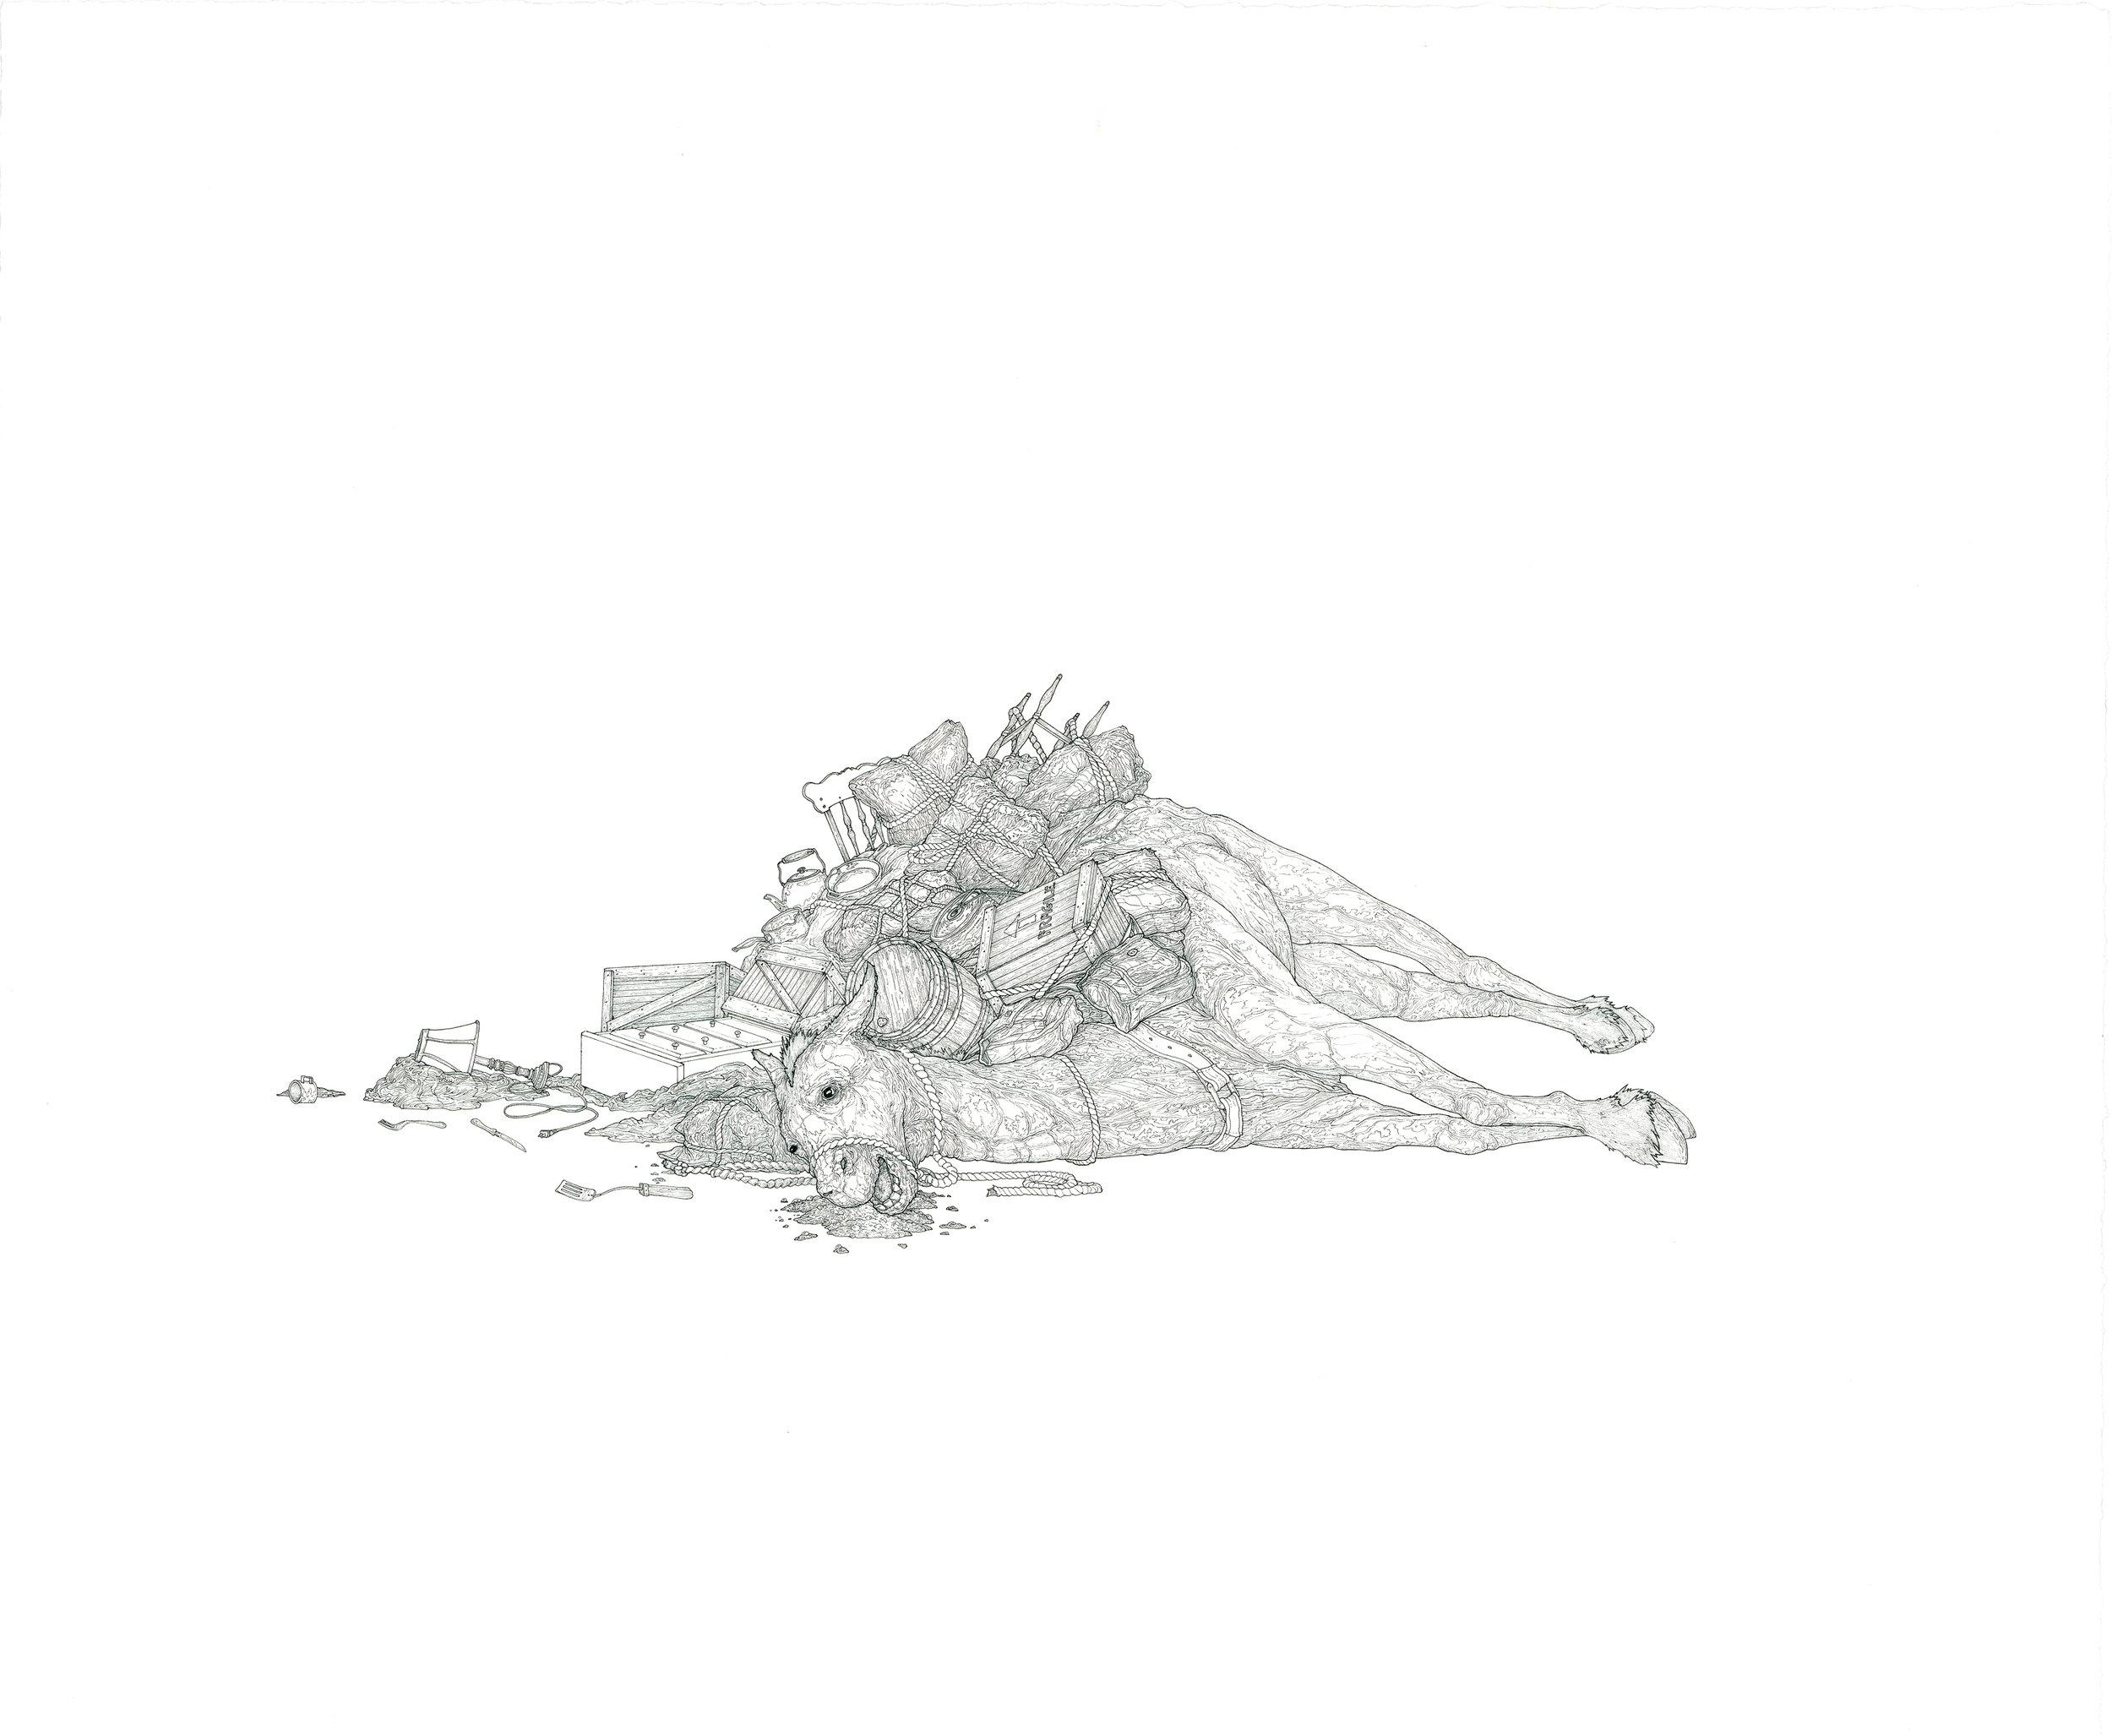 mule,  ink on paper, 25in .  x 17in., 2011